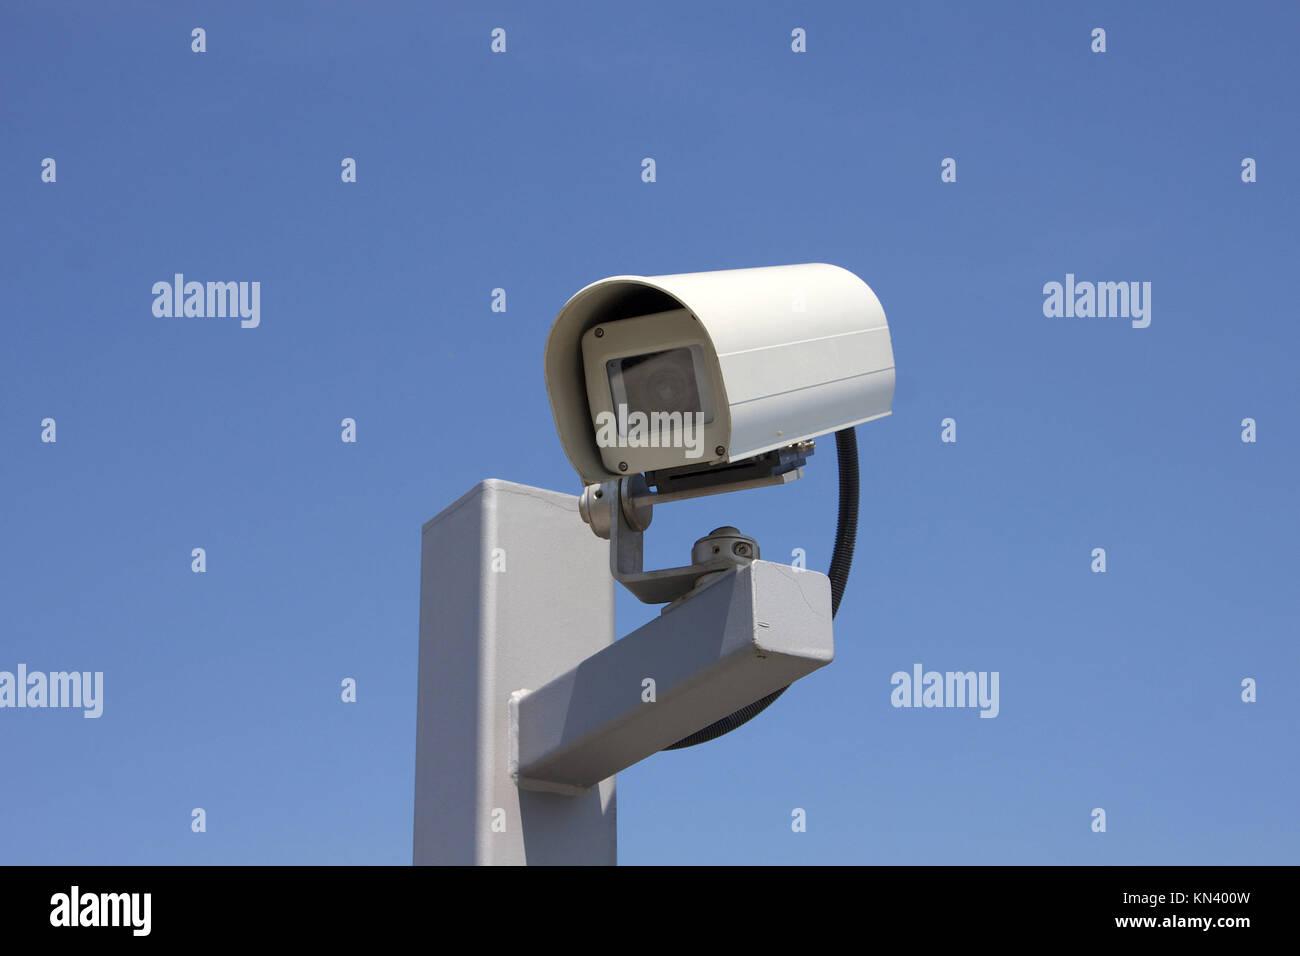 Modern outdoor surveillance camera facing left. - Stock Image